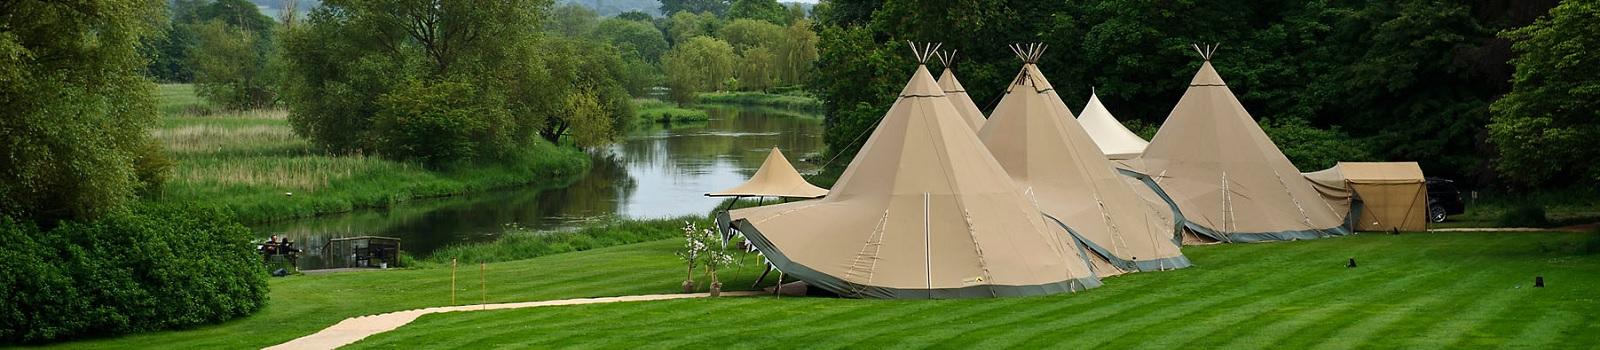 Houghton-Lodge-Wedding-Tipis